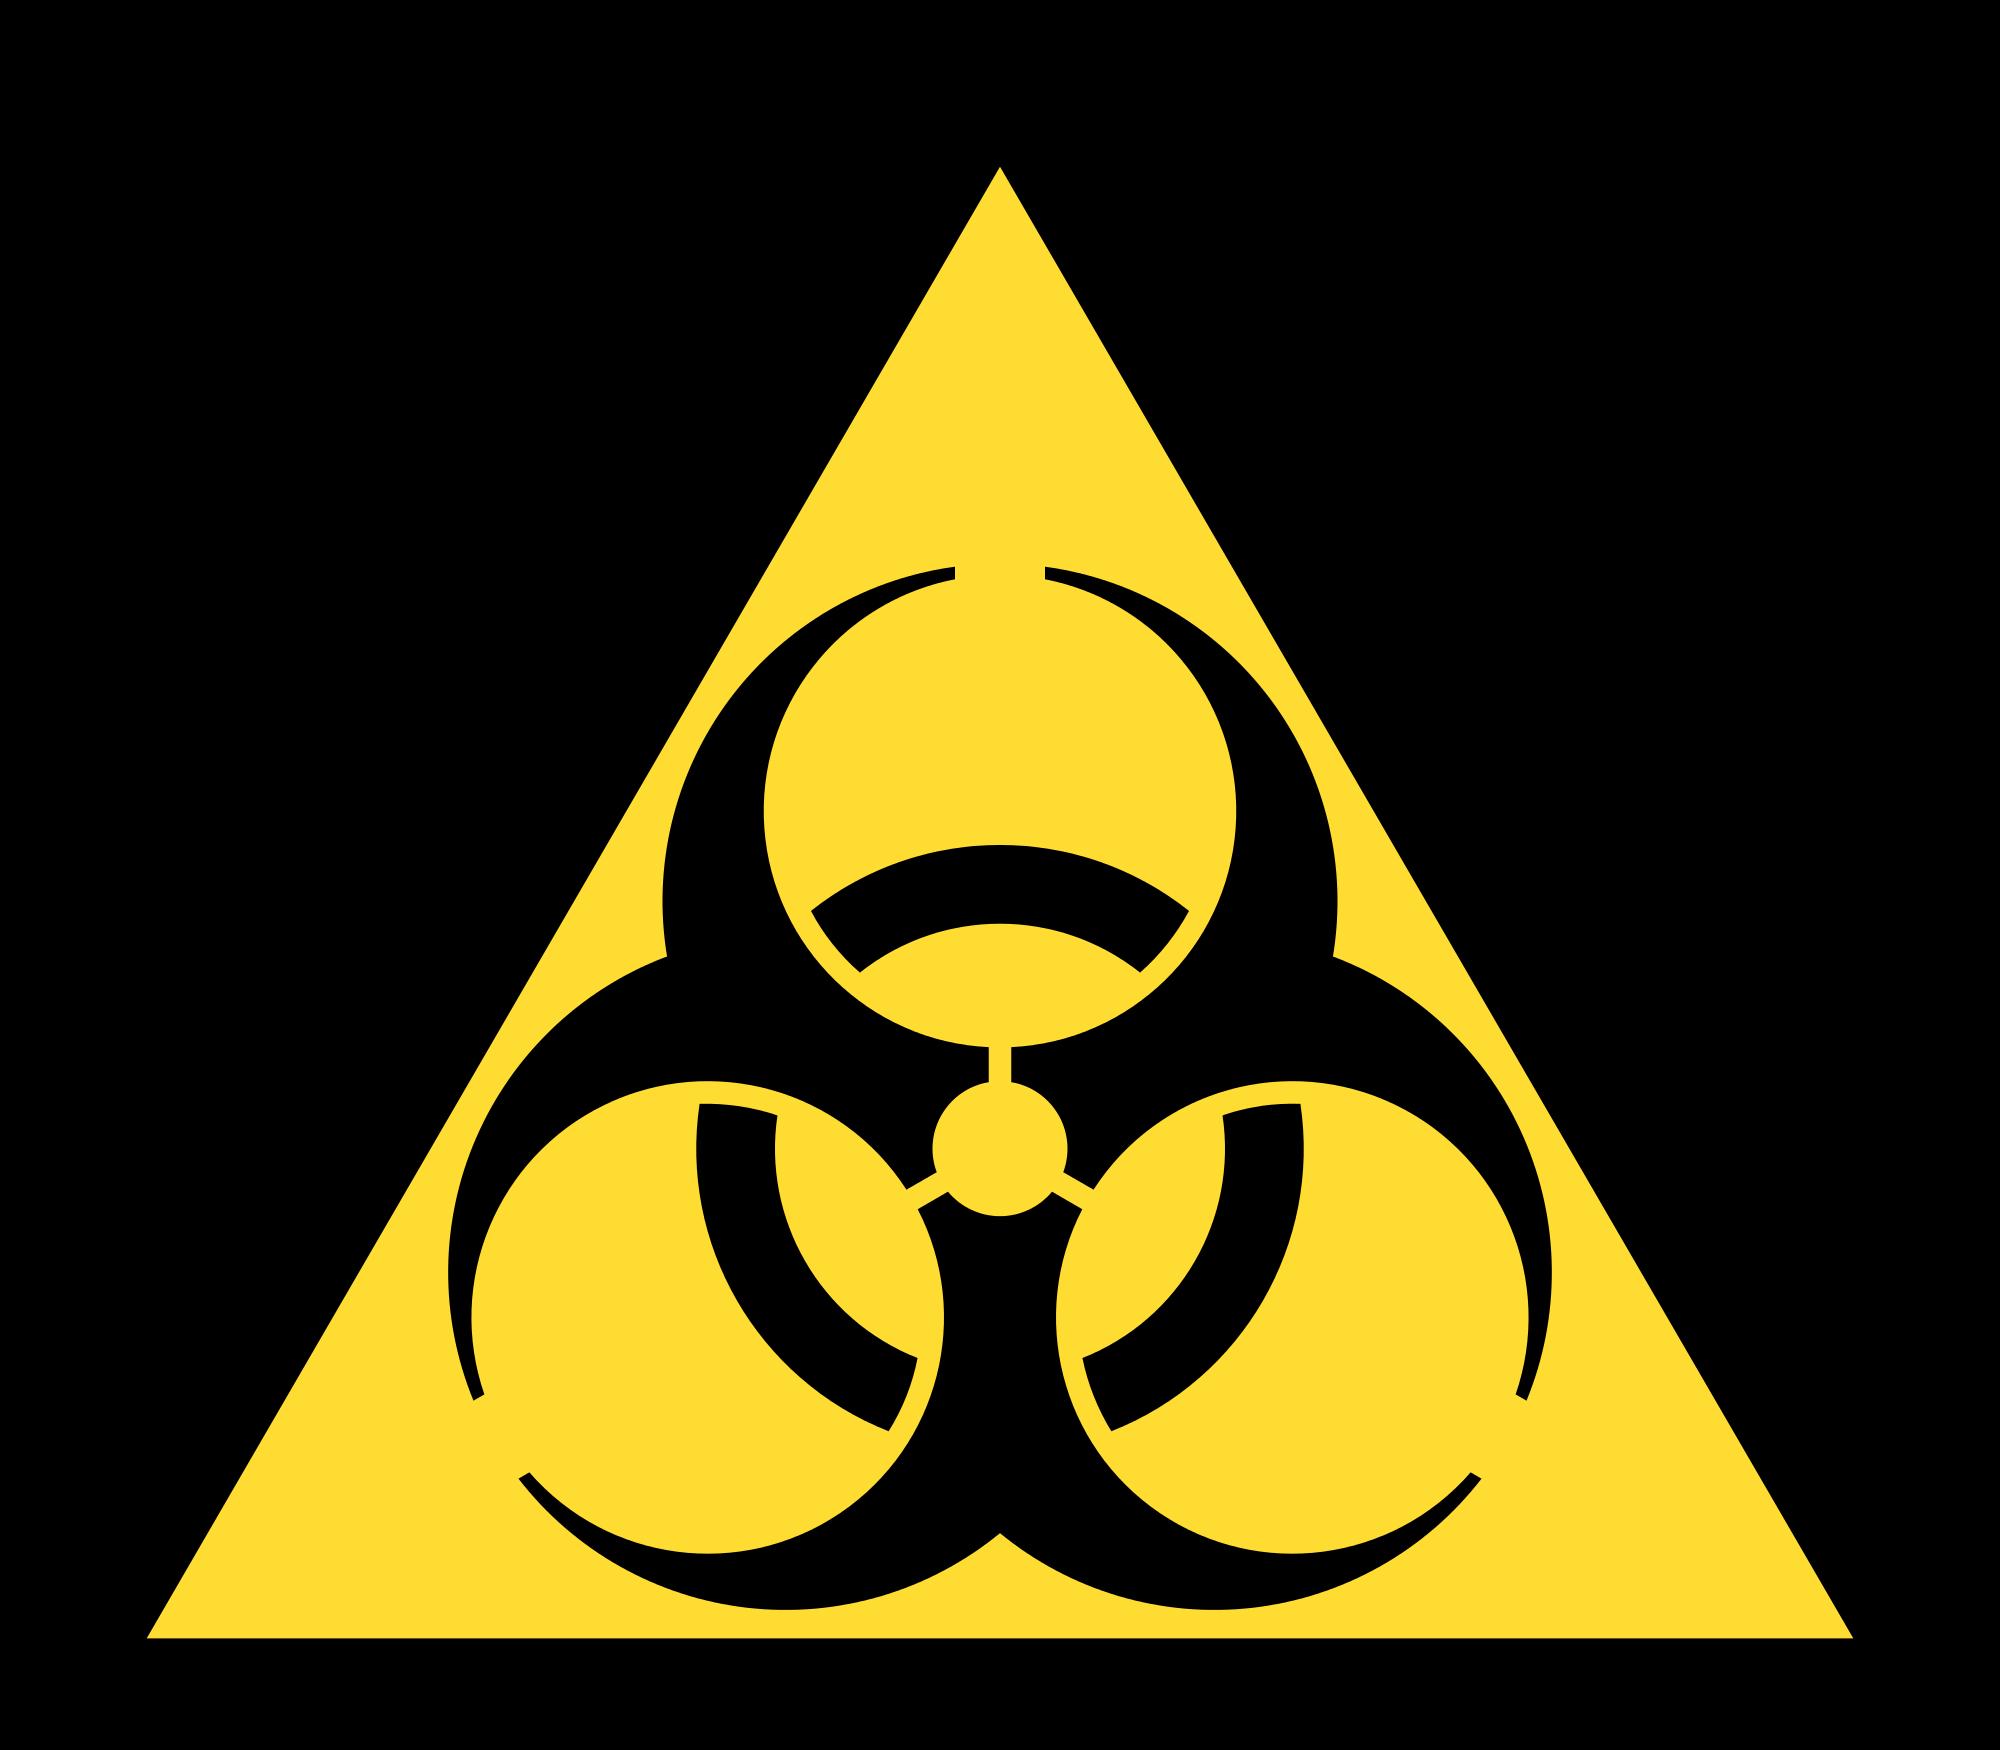 Biohazard Symbol PNG - 8684